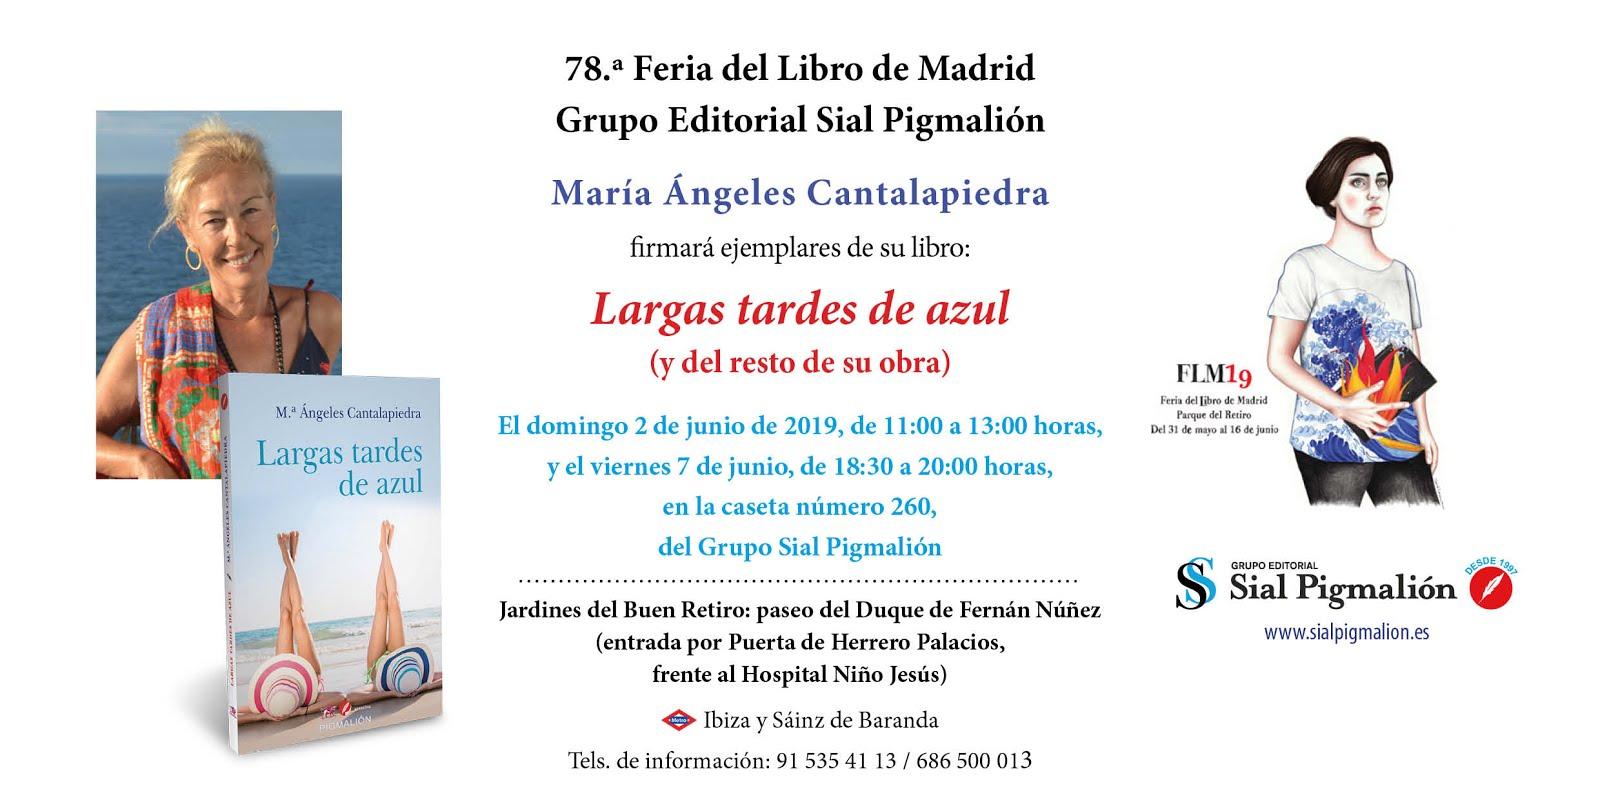 Feria del libro, Madrid 2019